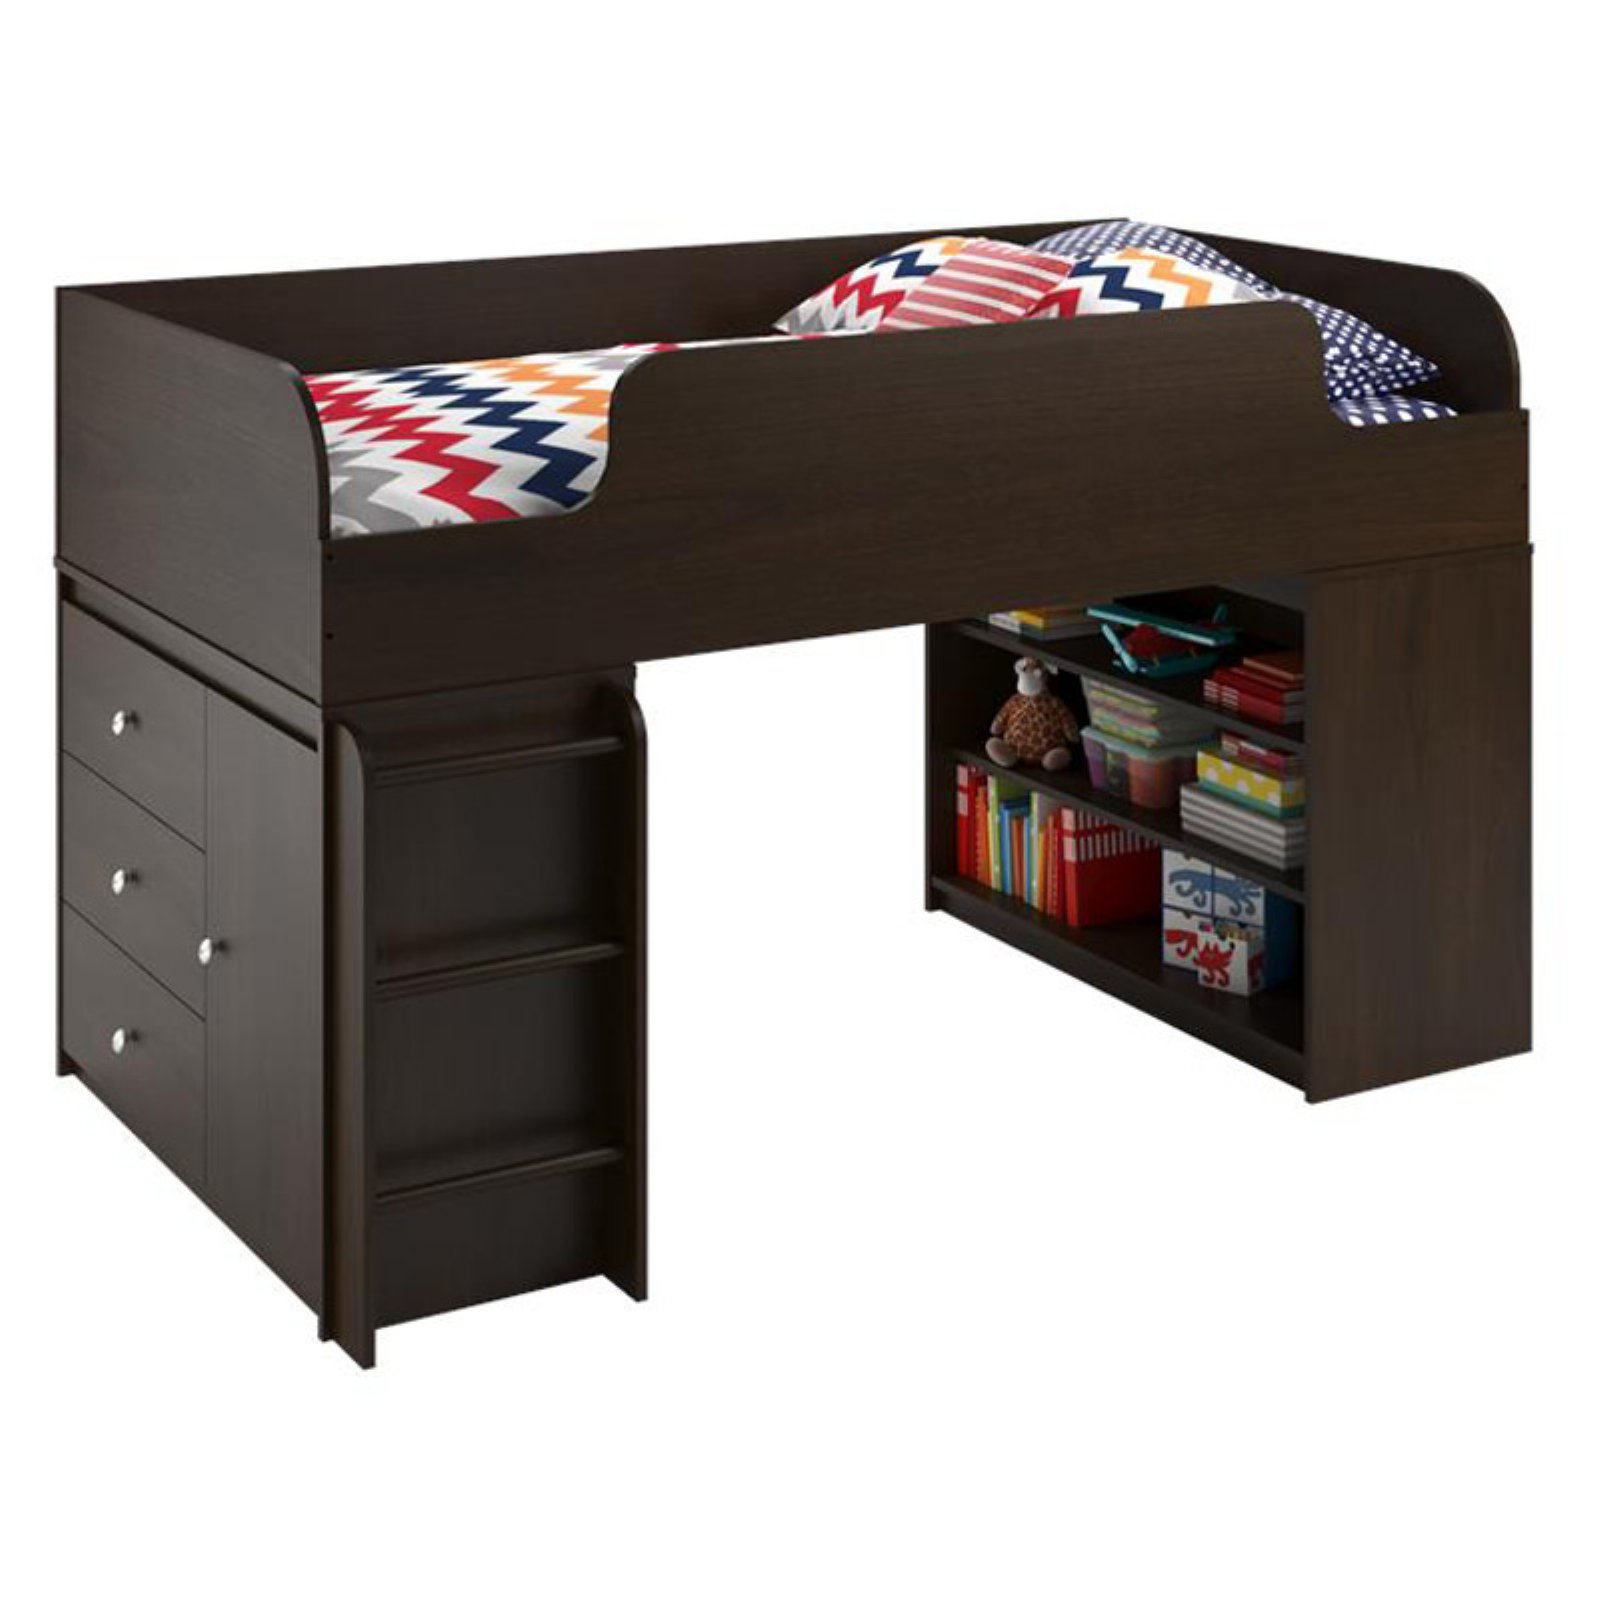 Ameriwood Home Elements Loft Bed with Bookcase and 3 Drawer Storage Organizer with Door, Dark Cherry